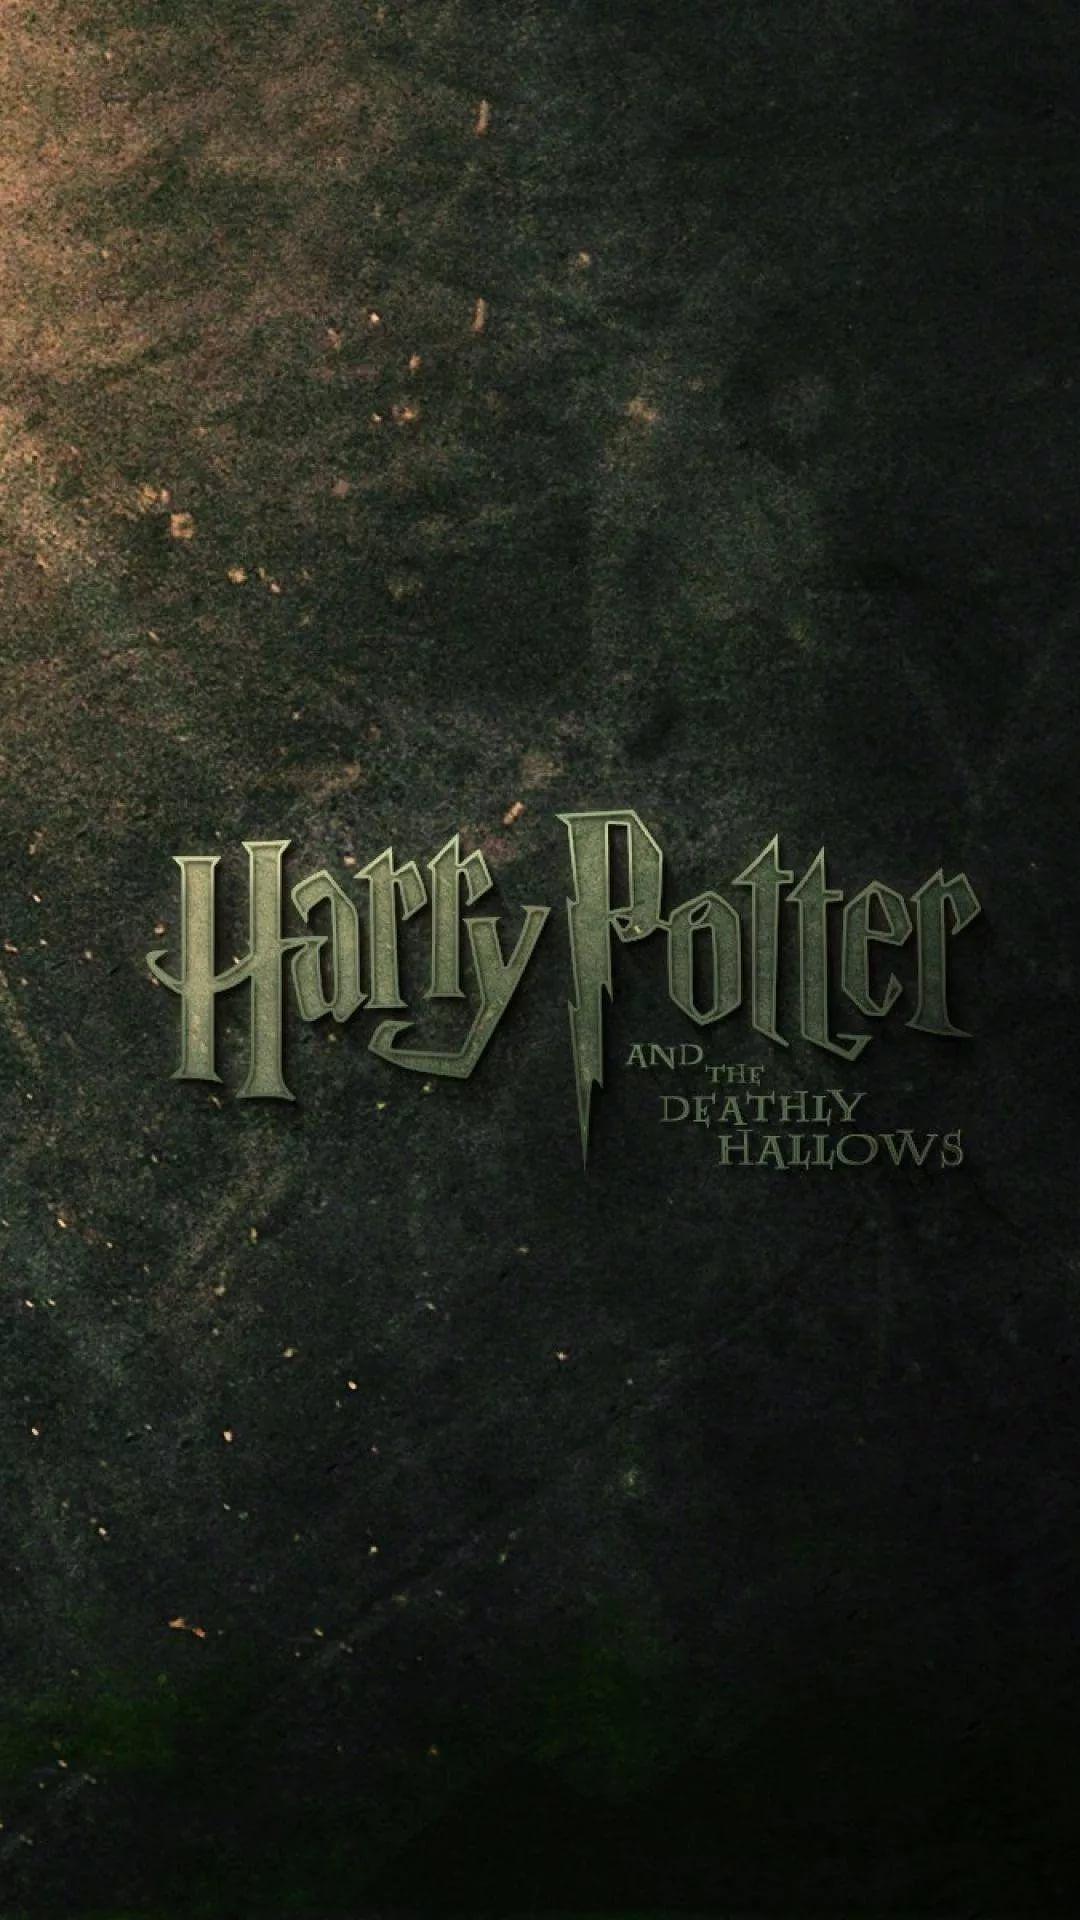 Harry Potter Hd Wallpaper - Iphone Wallpaper Harry Potter - HD Wallpaper